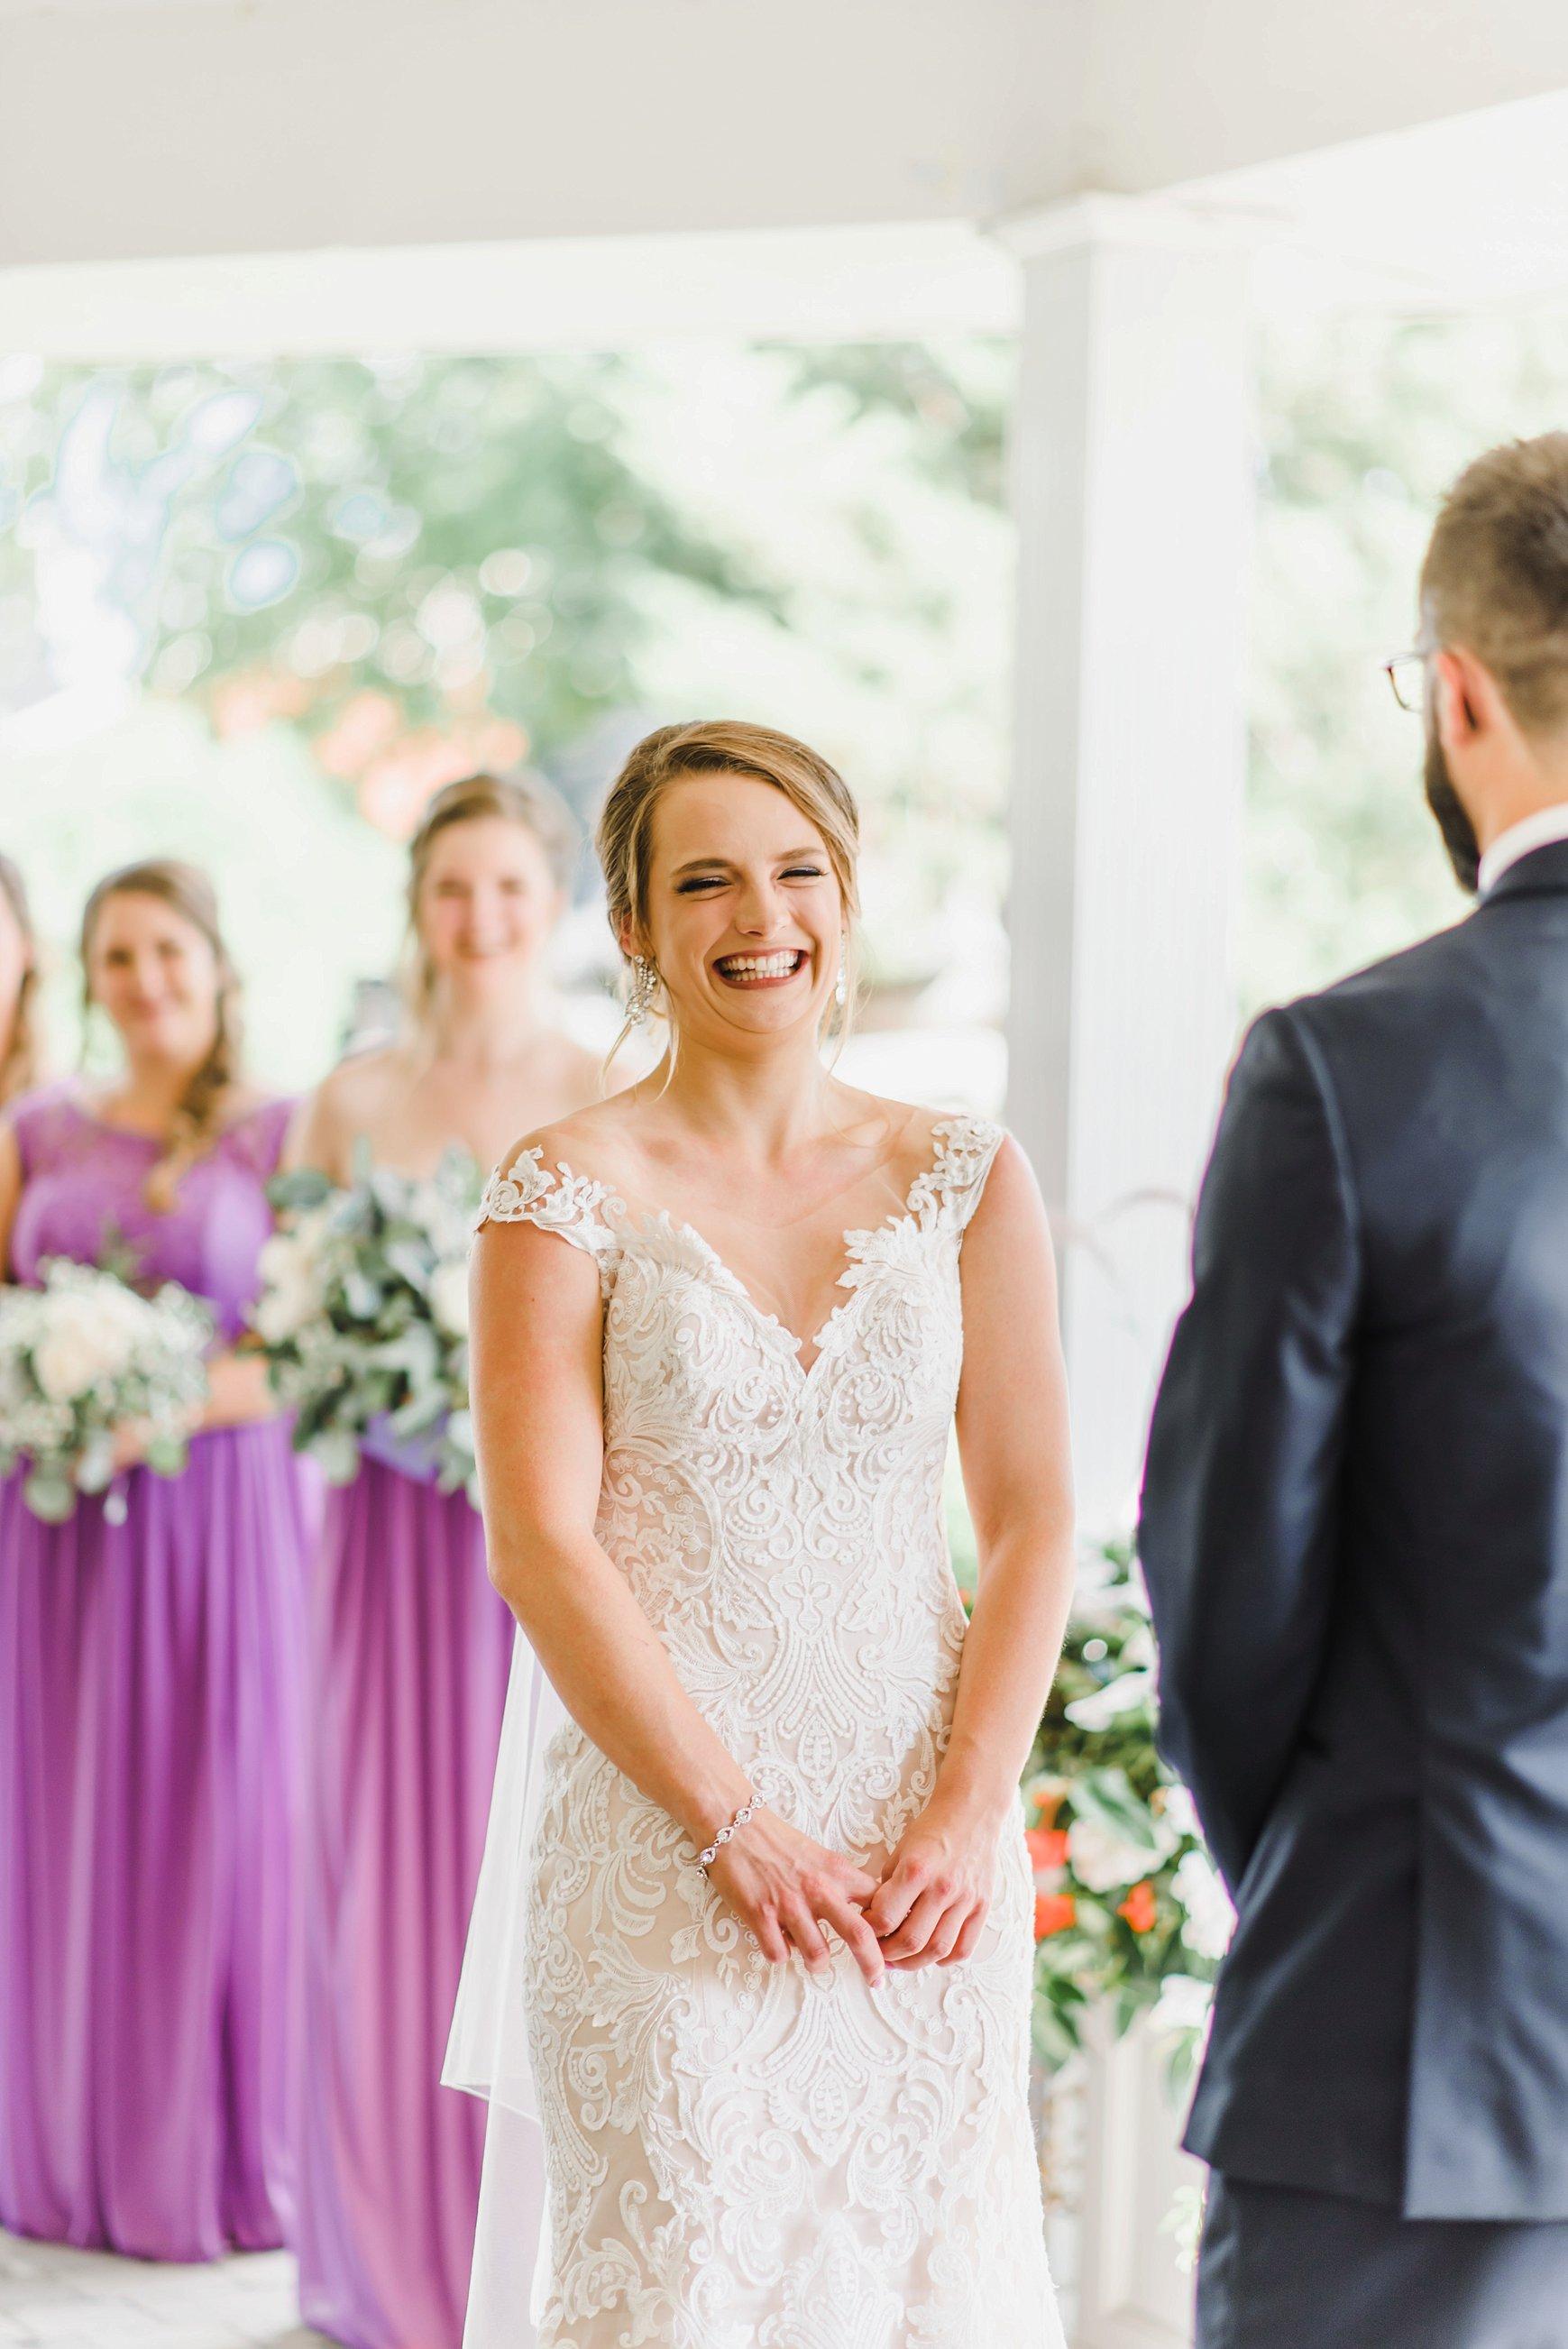 light airy indie fine art ottawa wedding photographer | Ali and Batoul Photography_1270.jpg